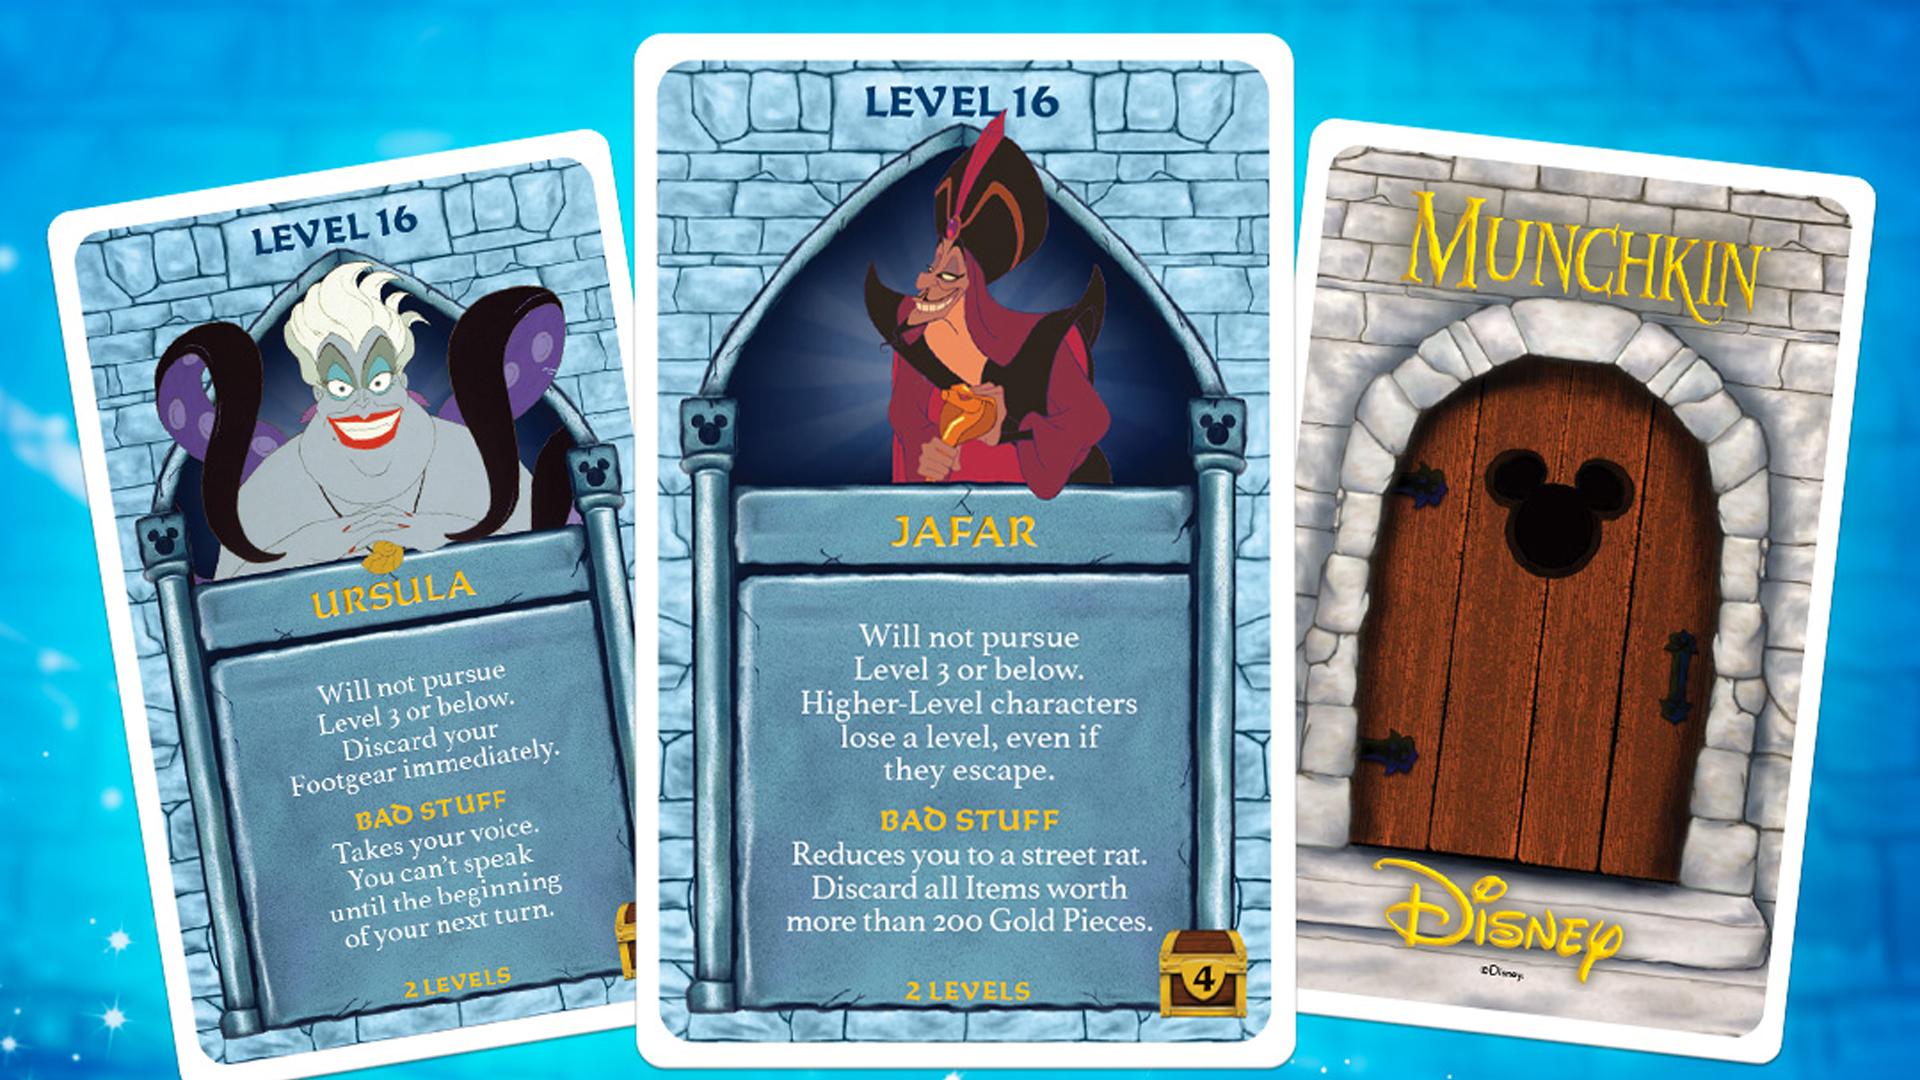 Munchkin: Disney board game cards